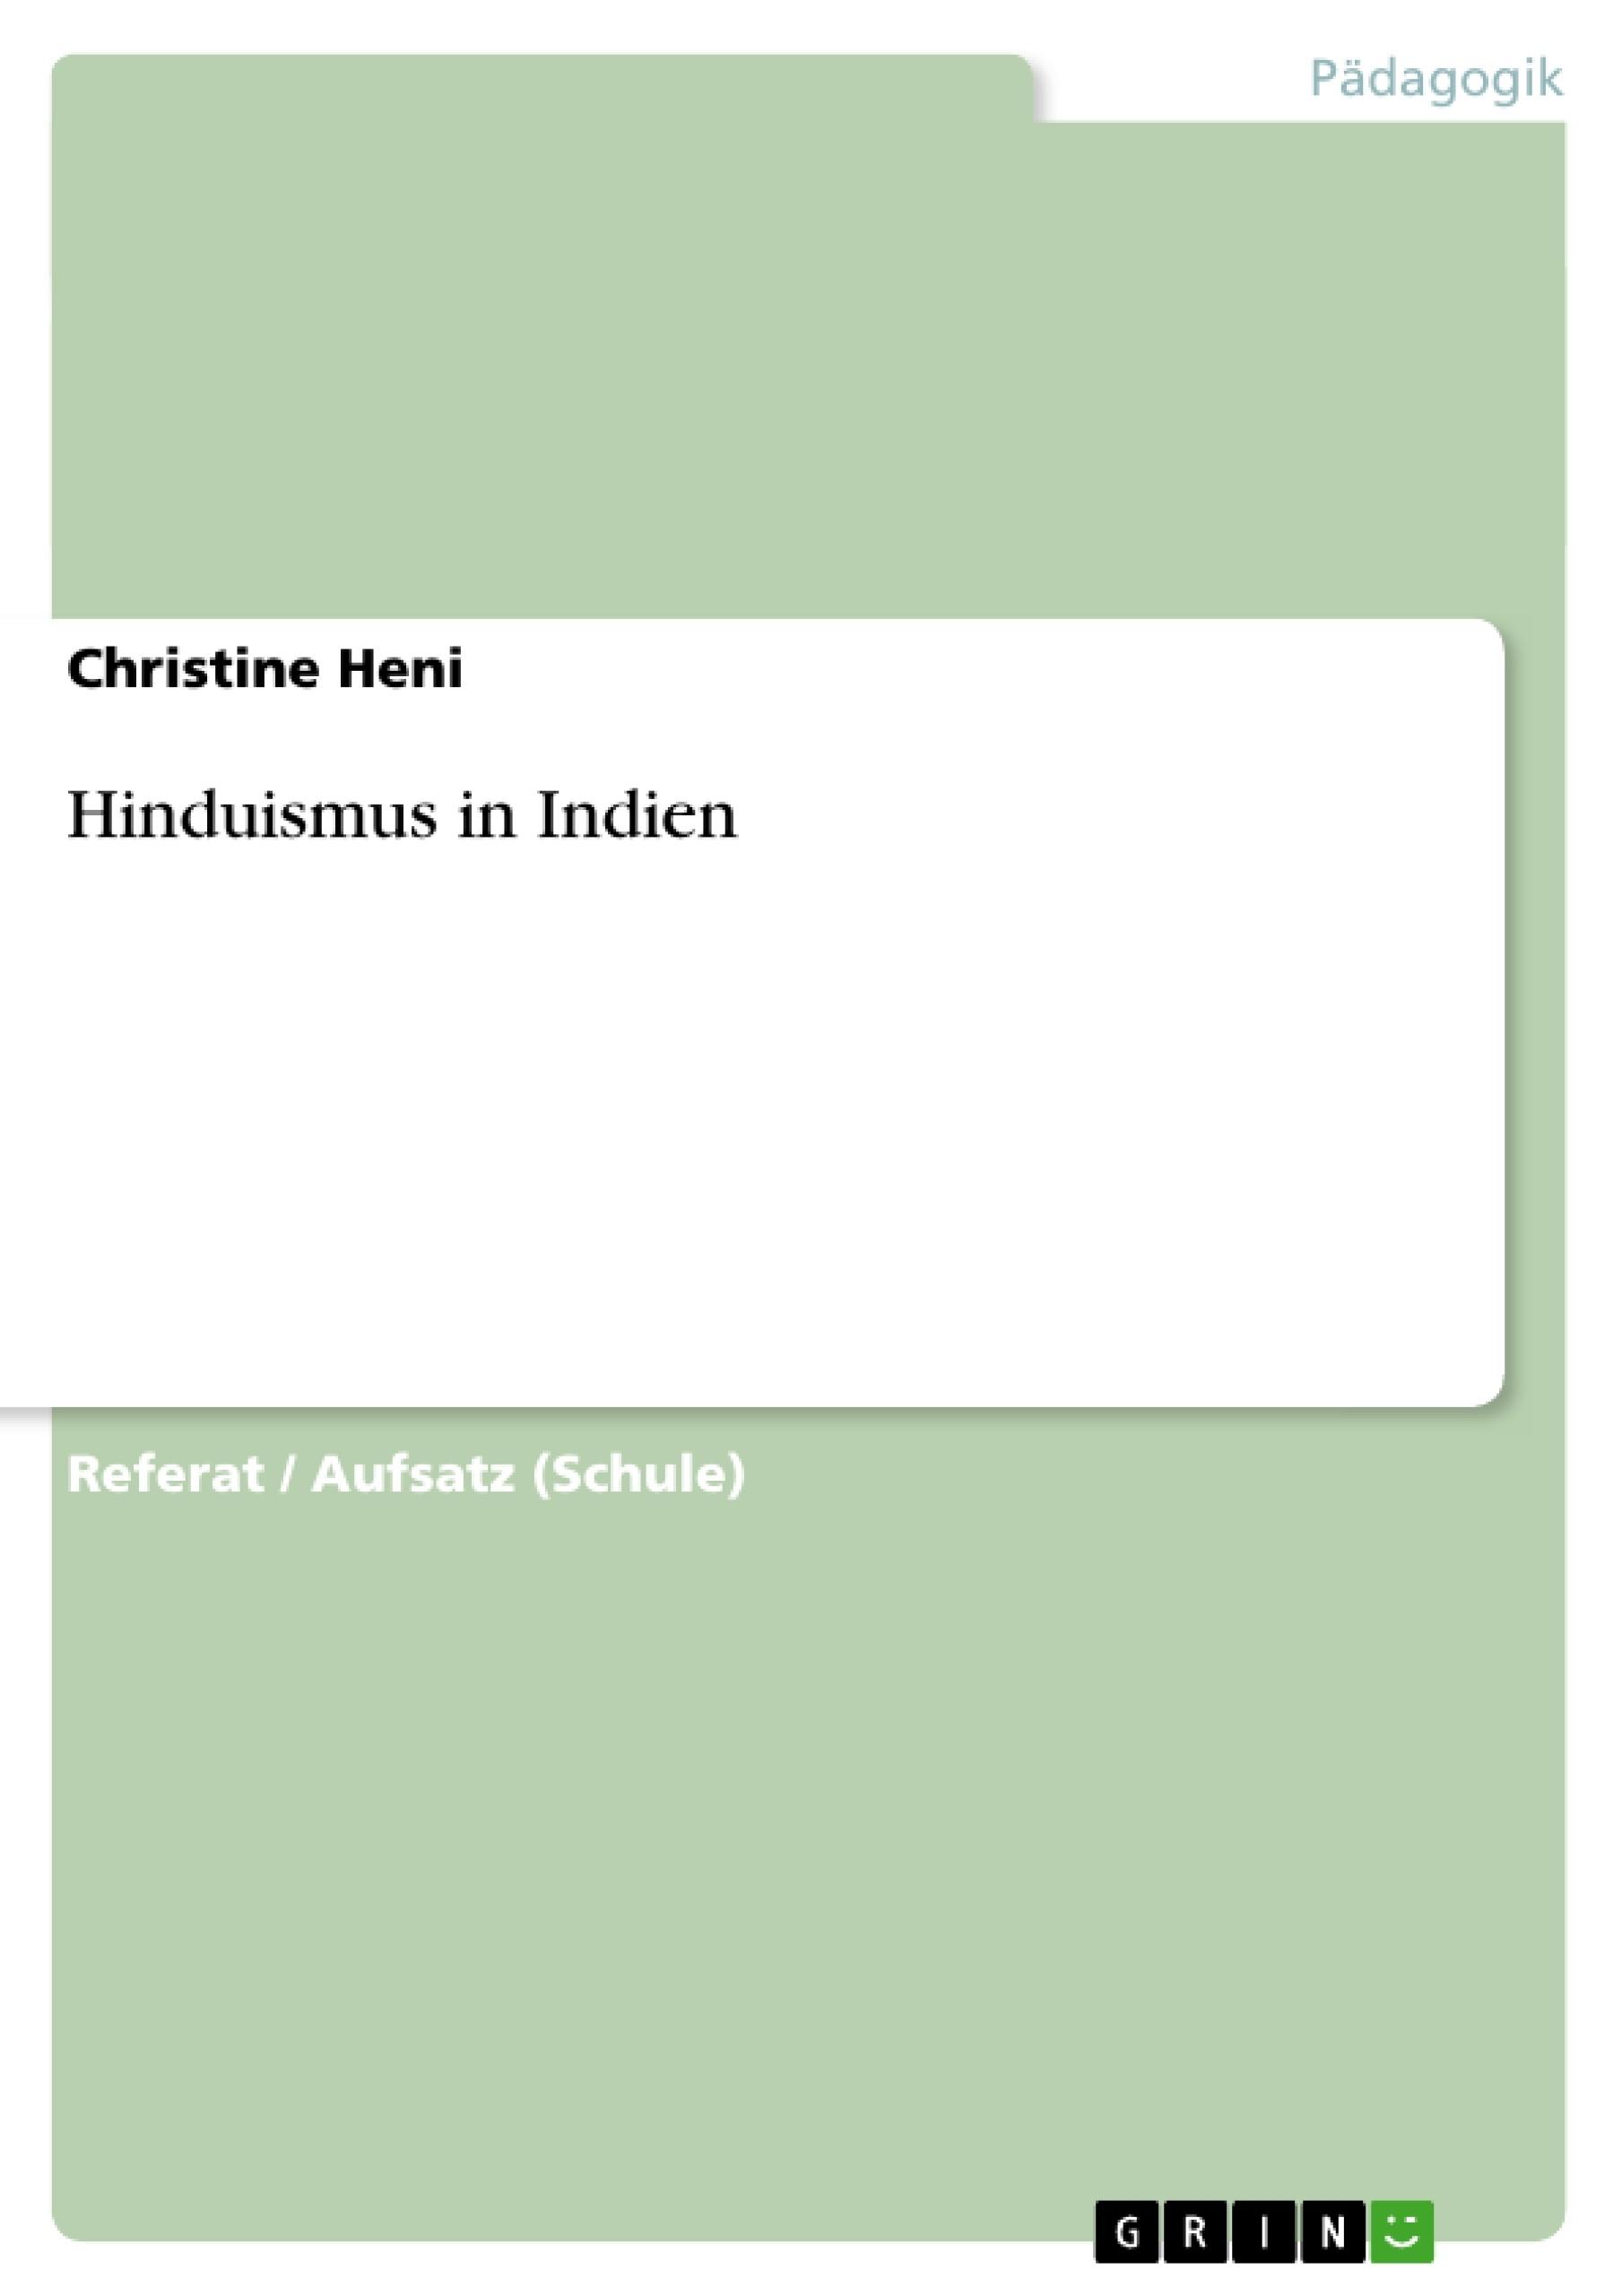 Titel: Hinduismus in Indien